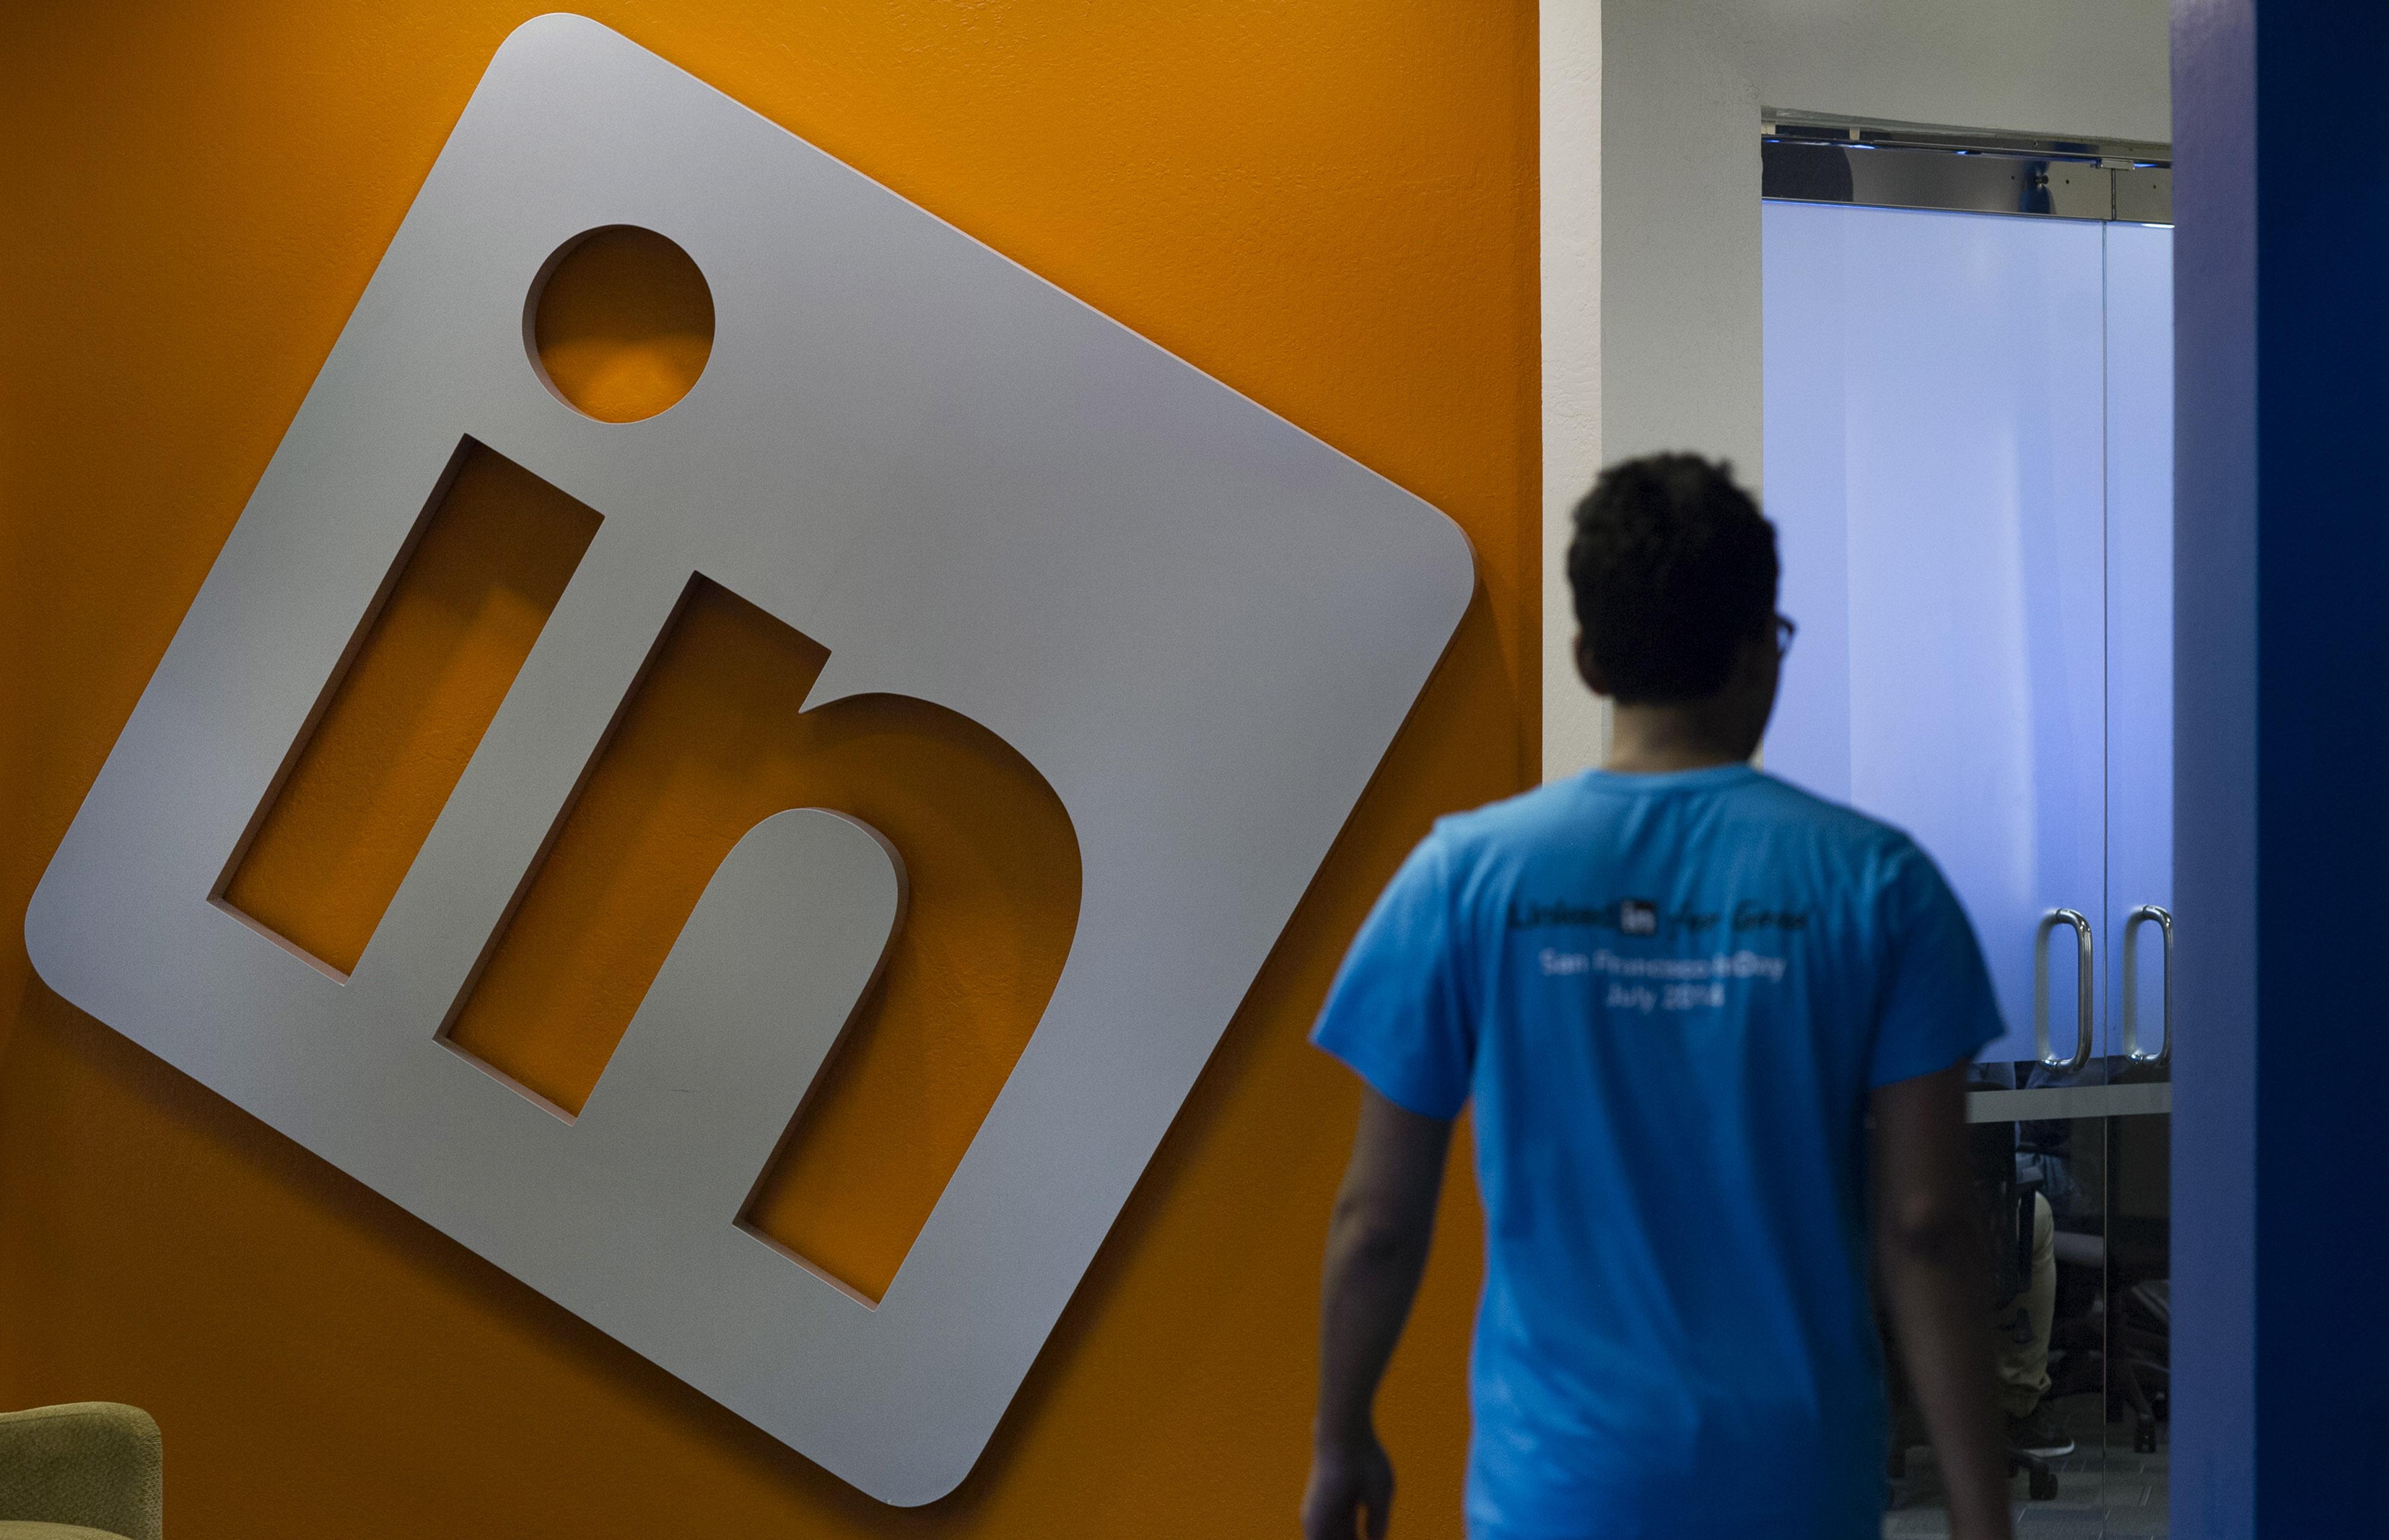 Inside LinkedIn Corp. Headquarters Ahead Of Earnings Figures